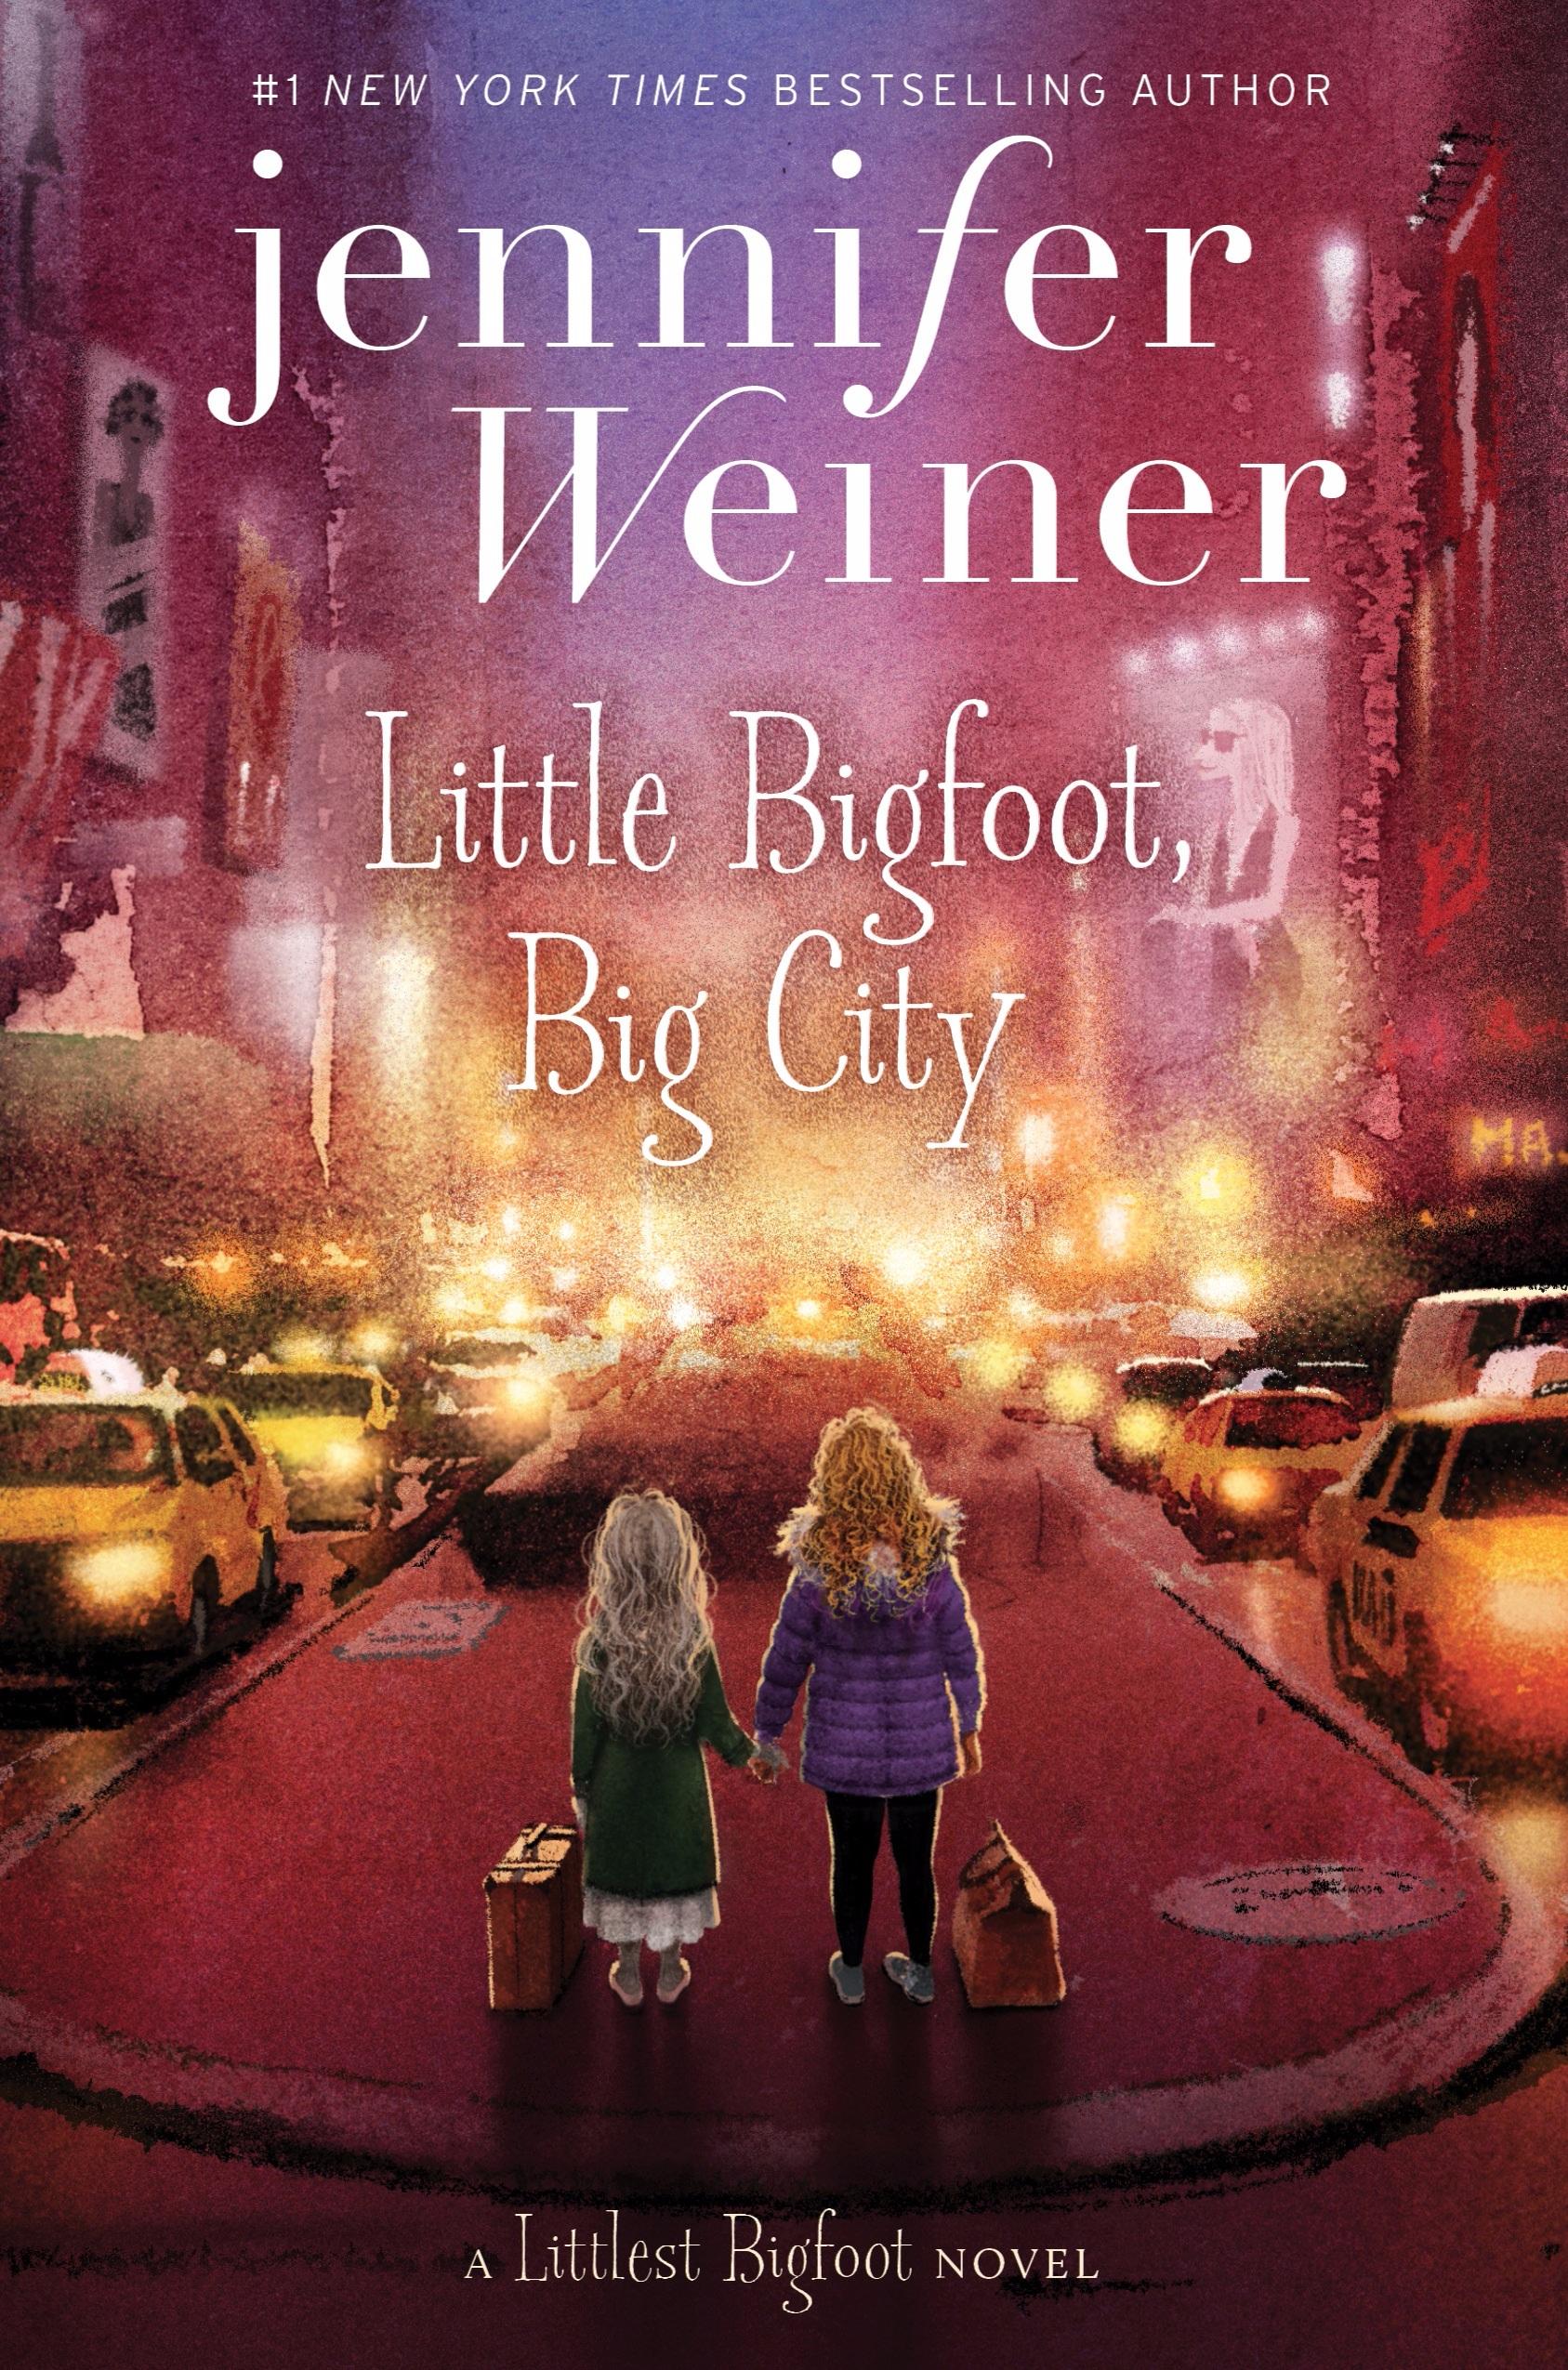 Little+Bigfoot%2C+Big+City.jpg